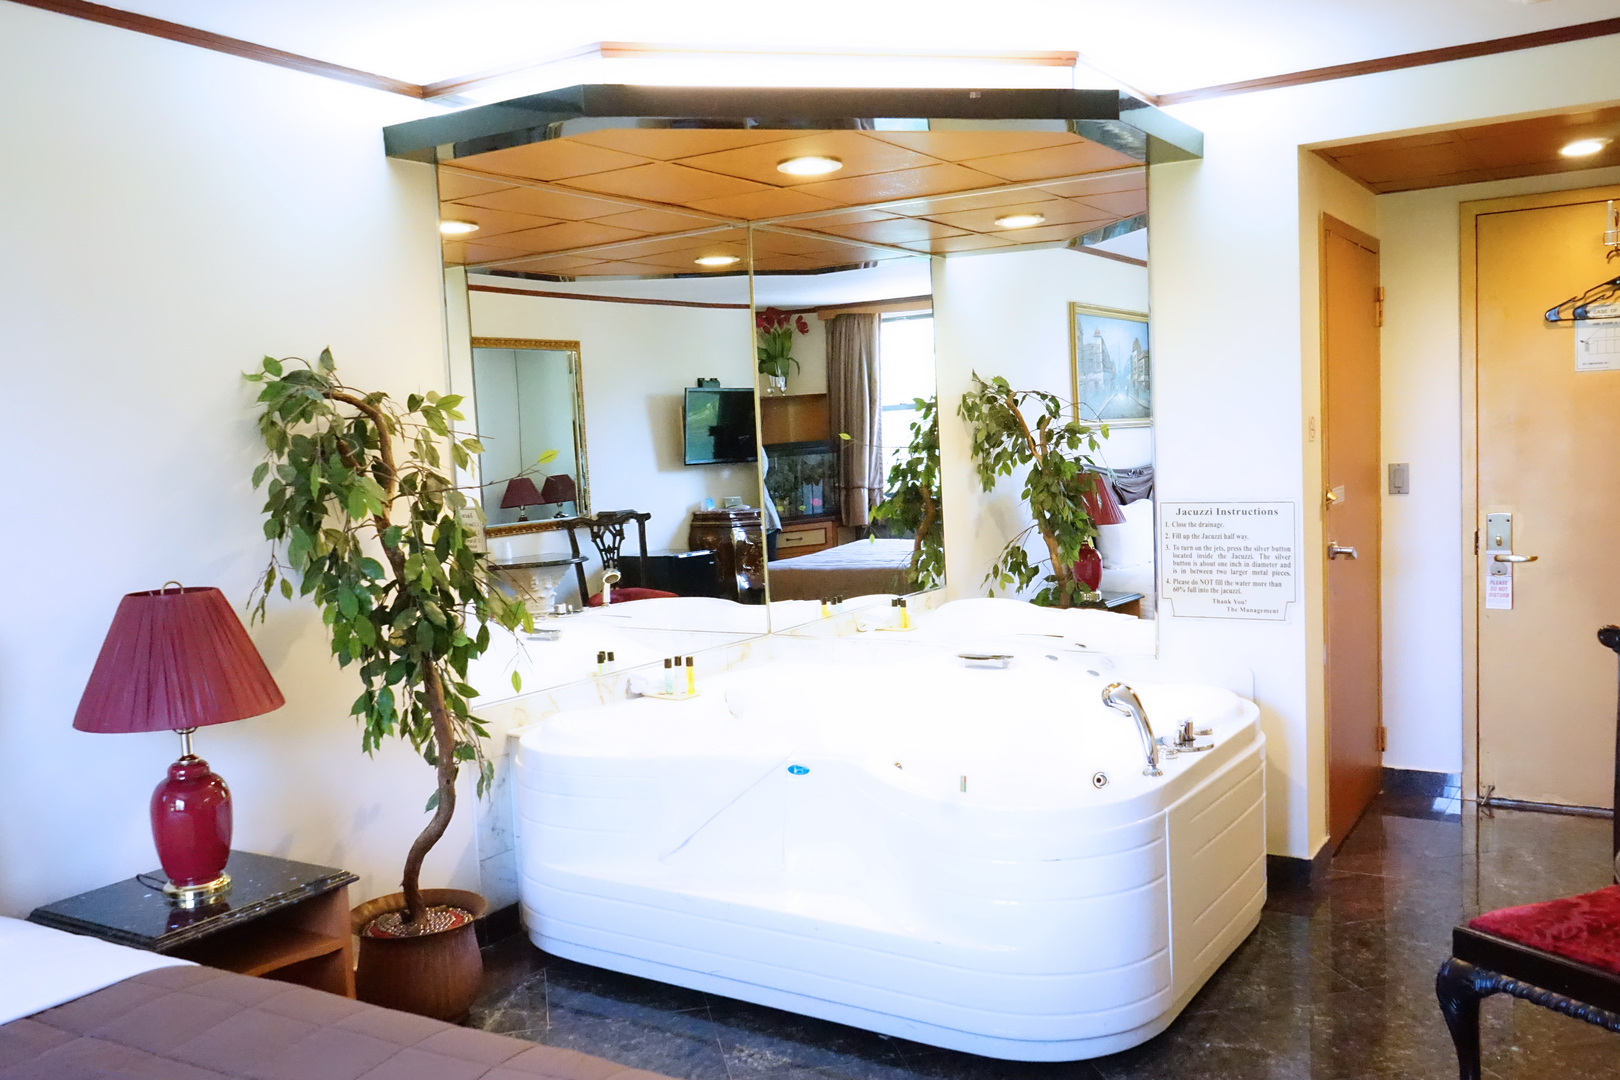 Hotels With Jacuzzi In Room Nj Enredada